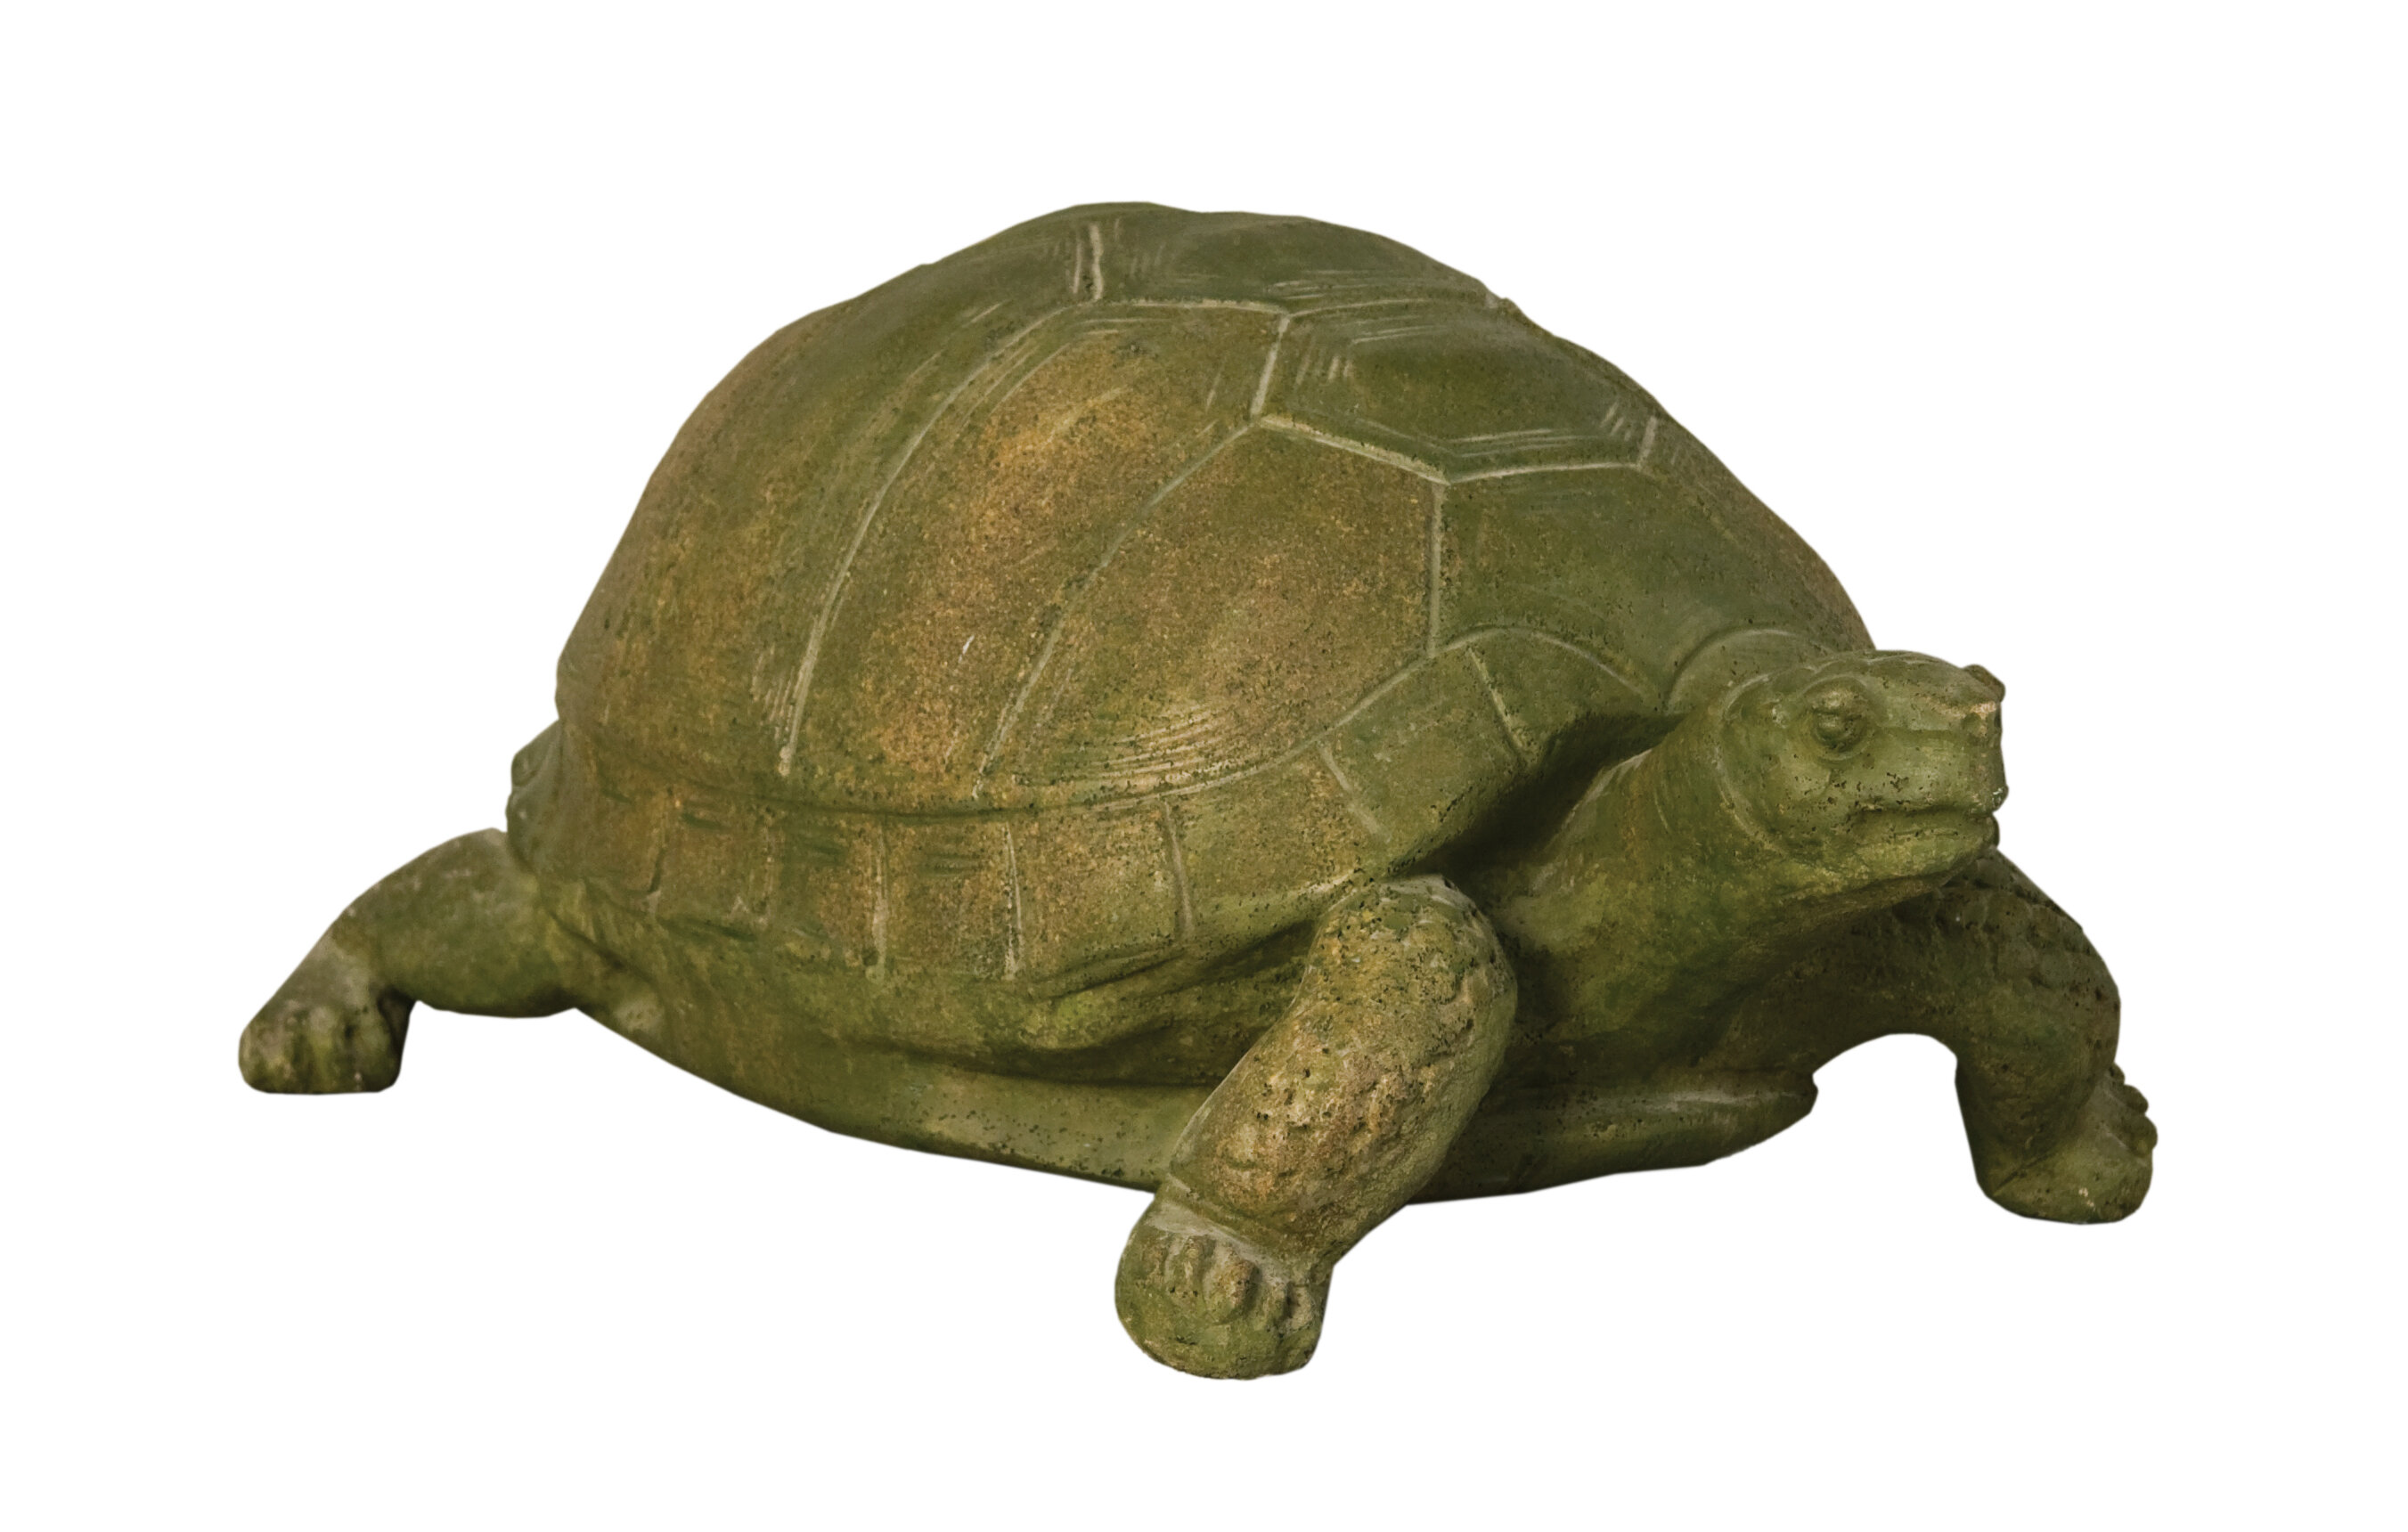 OrlandiStatuary Animals Big Realistic Turtle Statue & Reviews   Wayfair